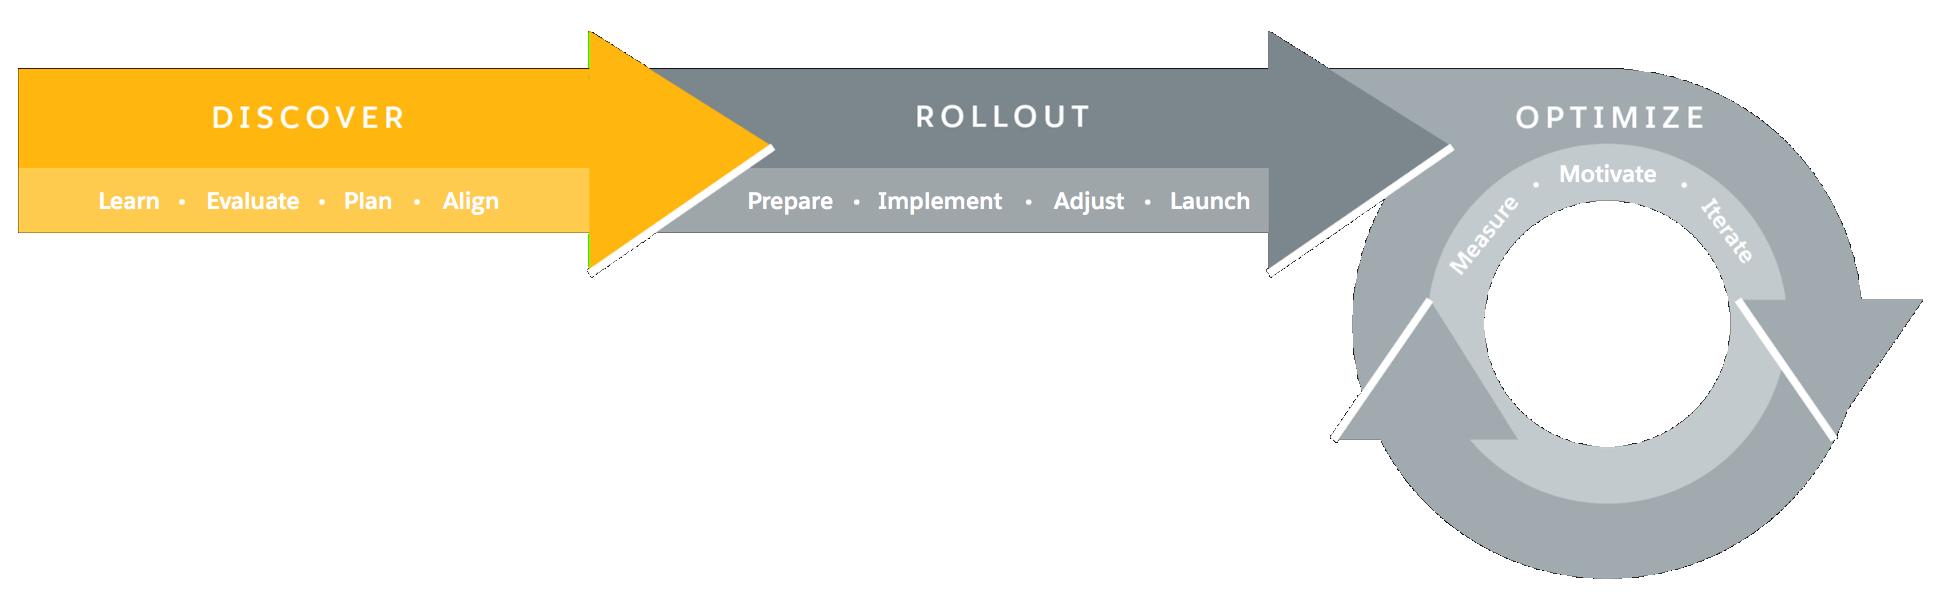 Lightning Experience の移行のフレームワークの視覚表示。発見フェーズが強調表示されています。